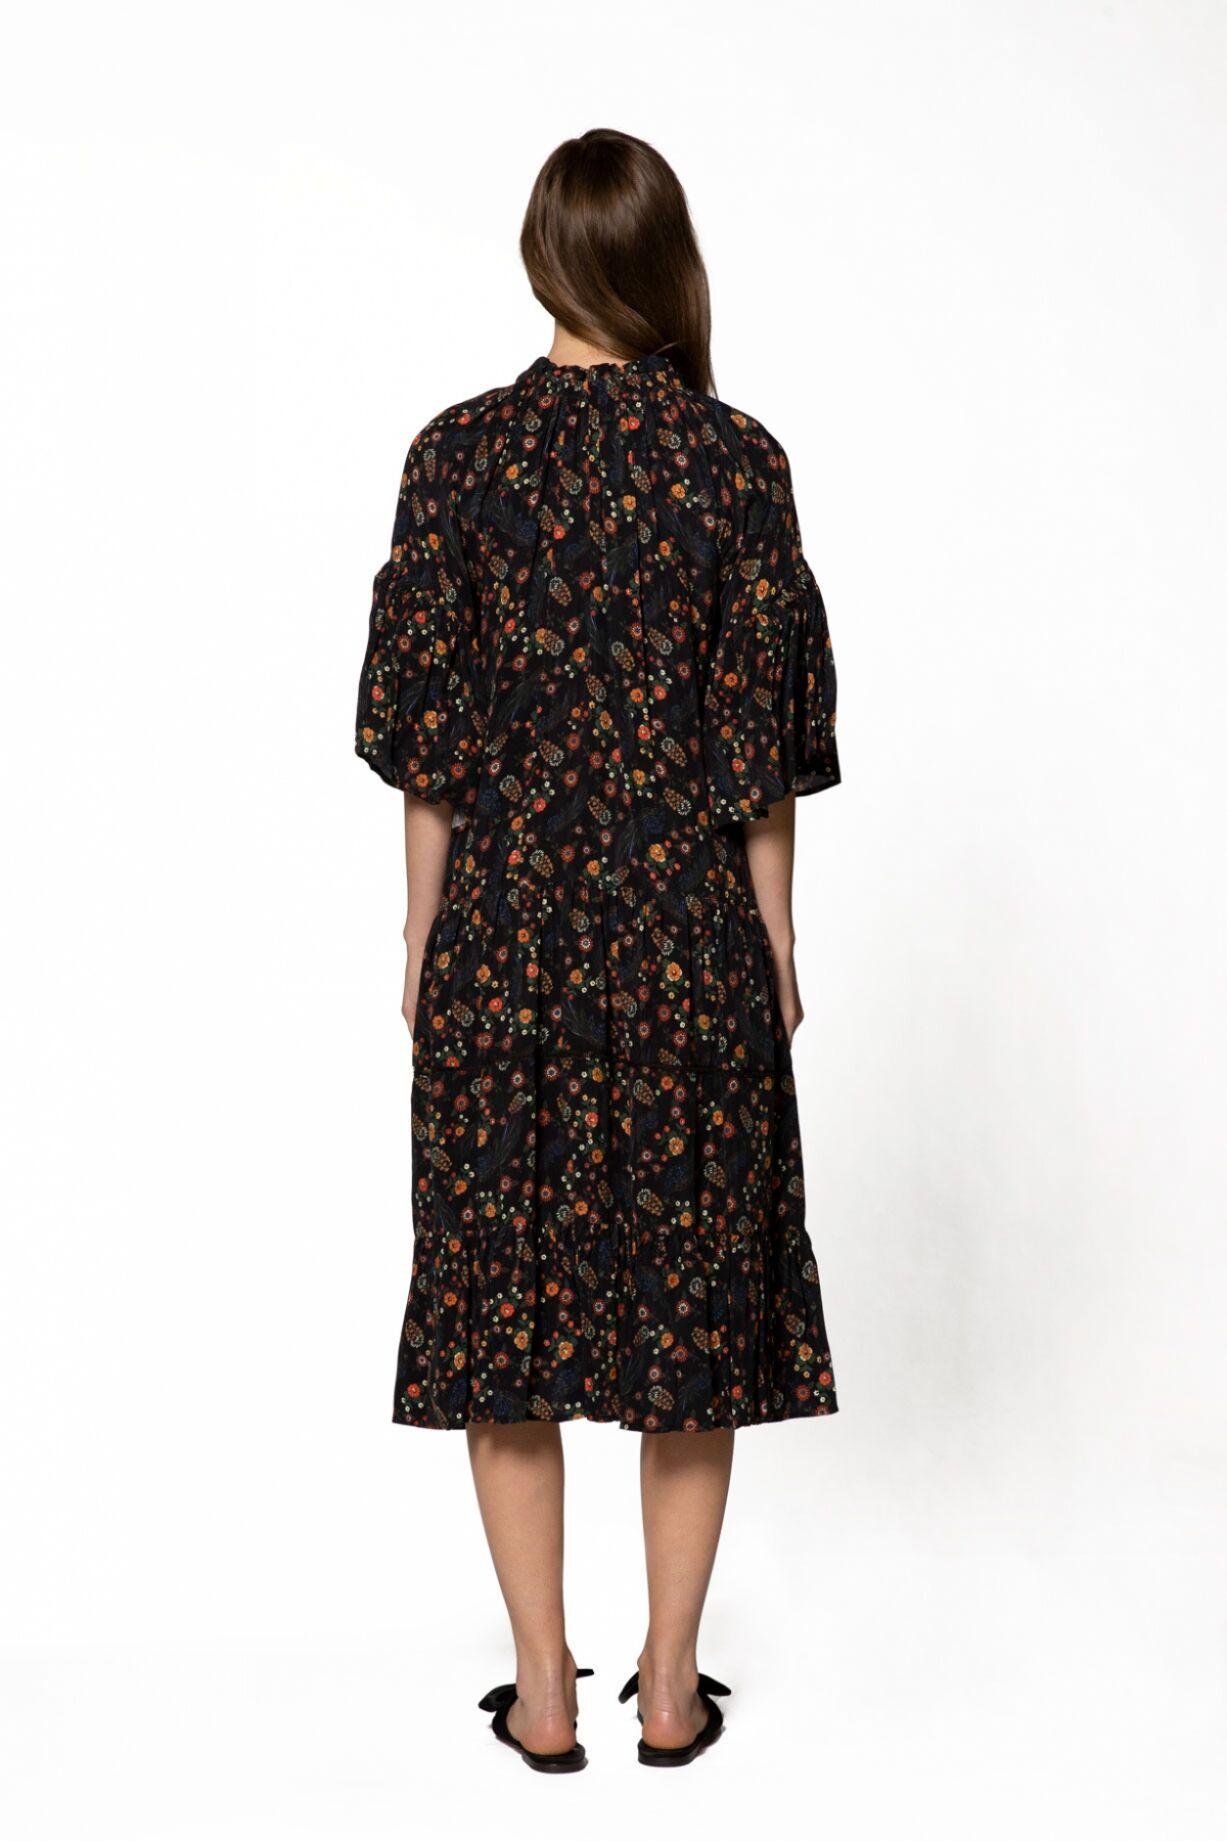 Bağlama Yaka, Desenli Midi Elbise